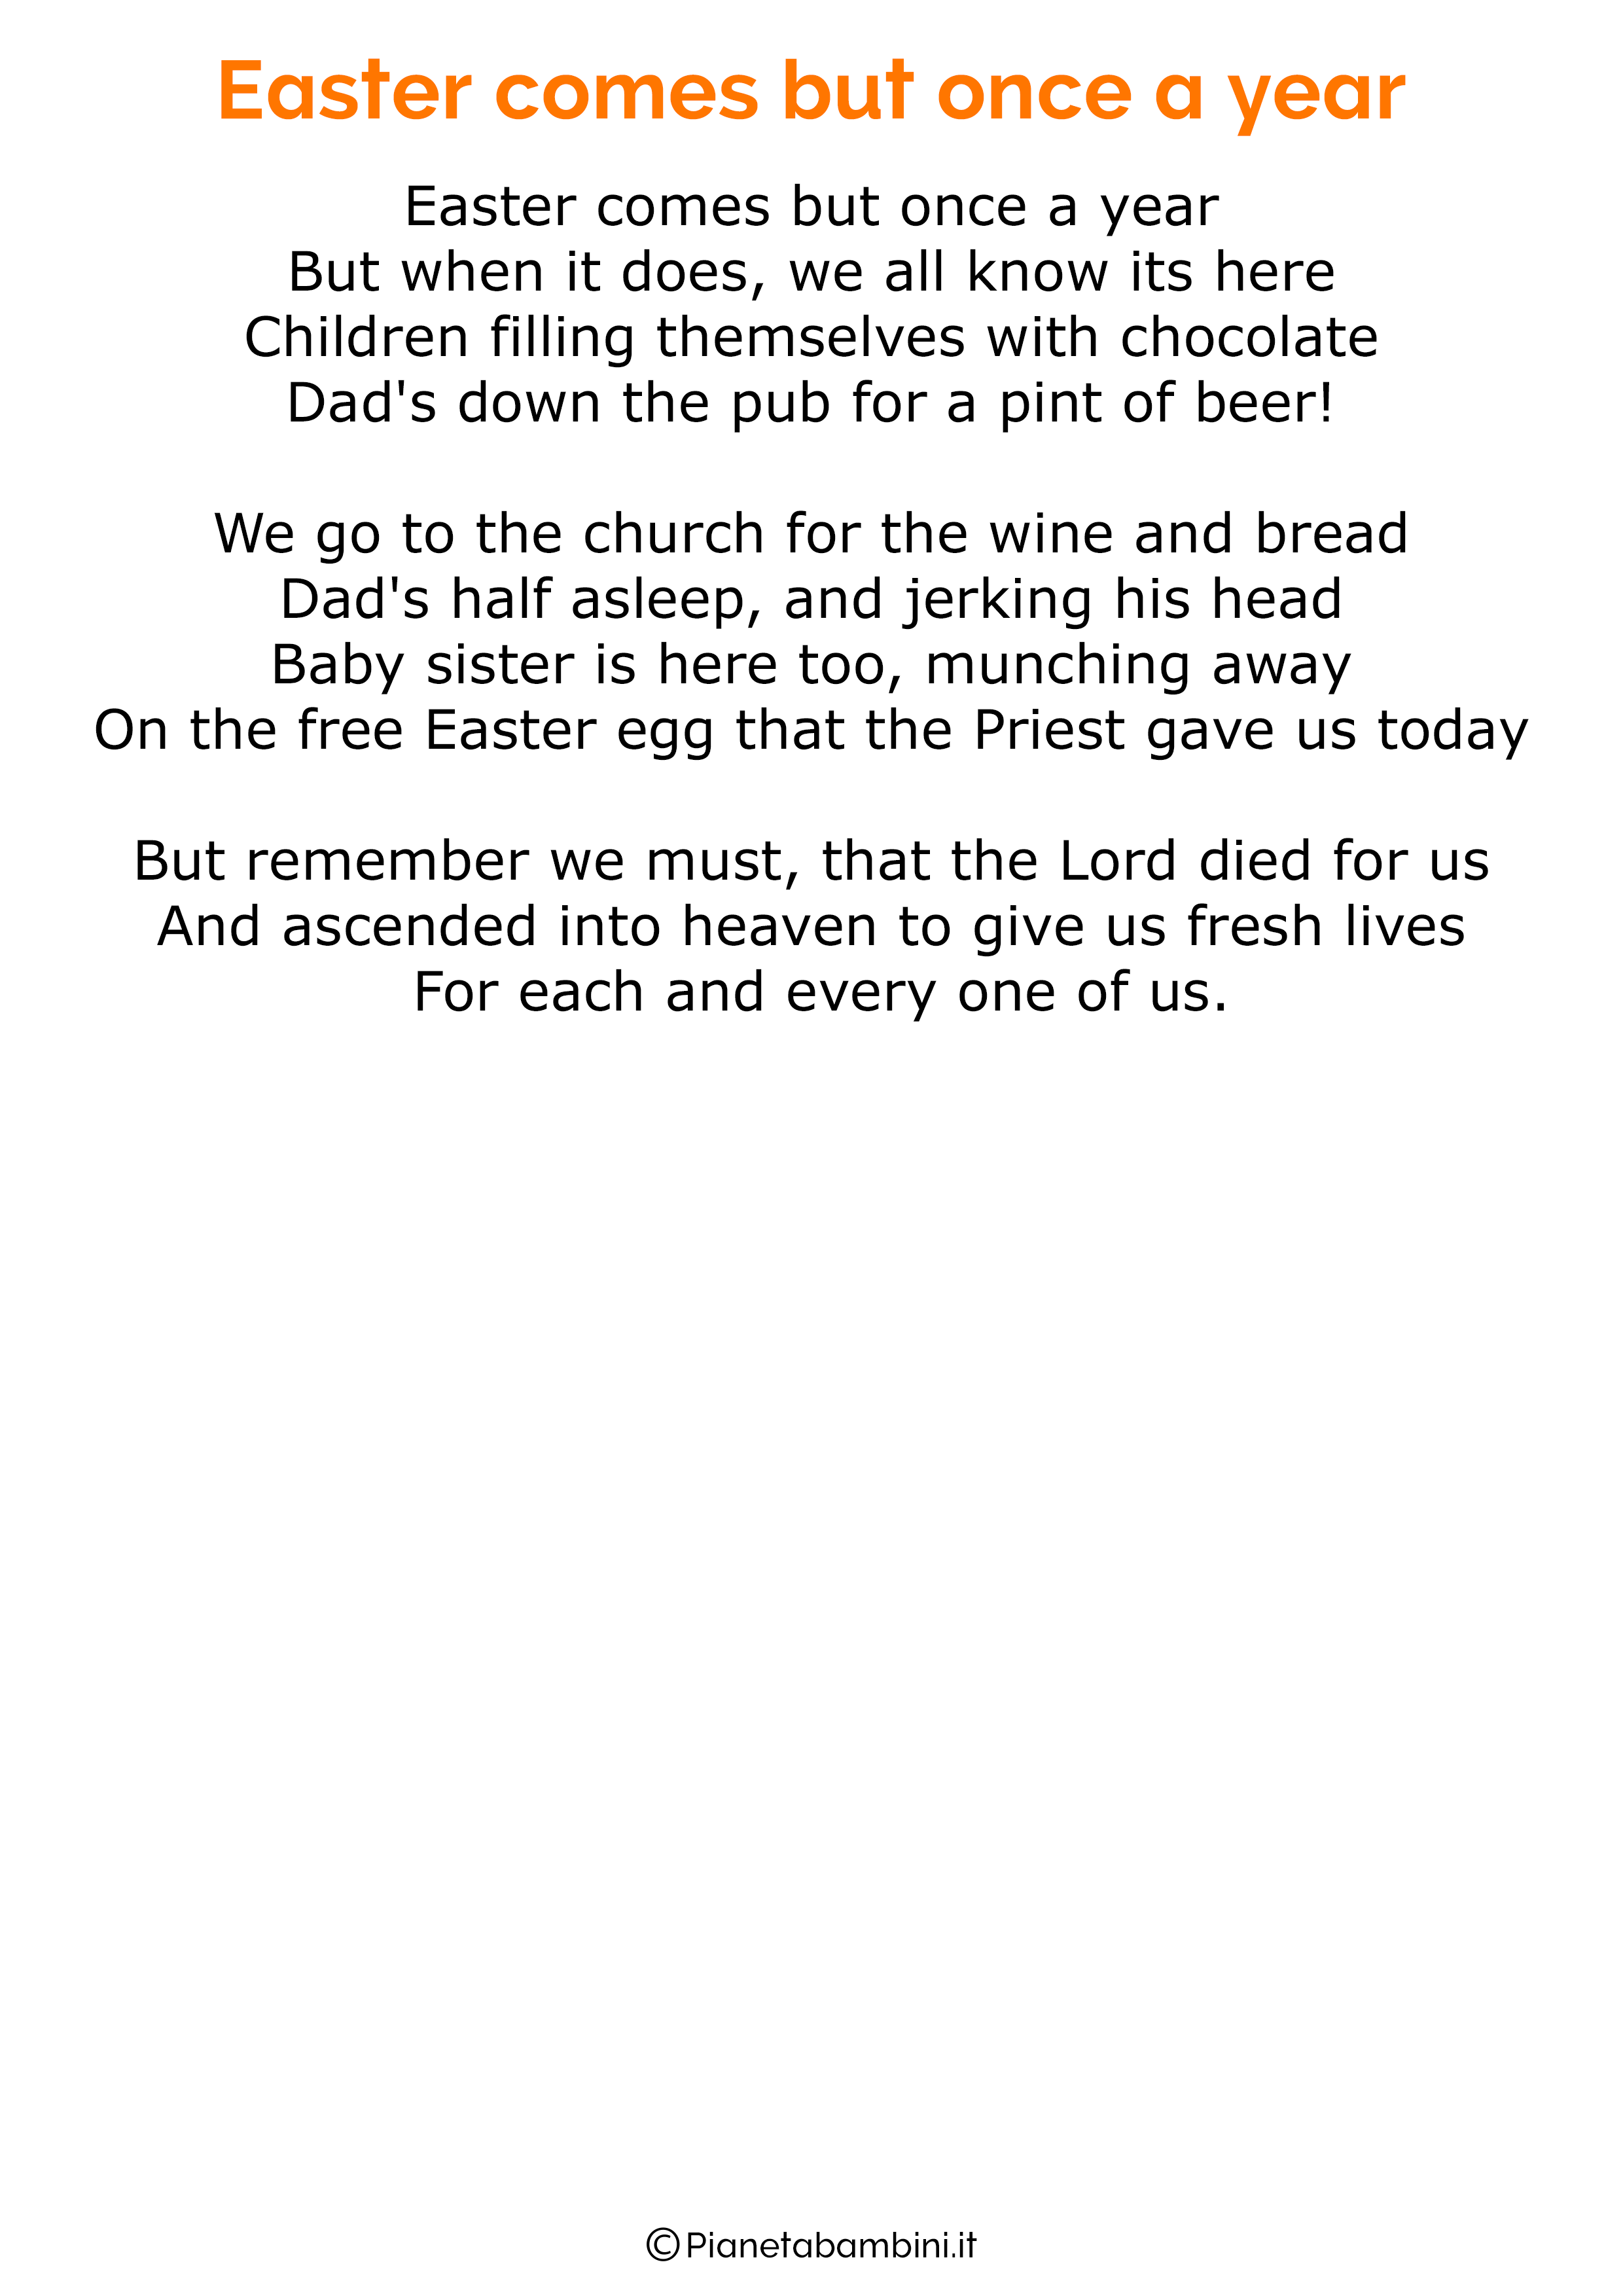 Poesie di Pasqua in inglese per bambini 15